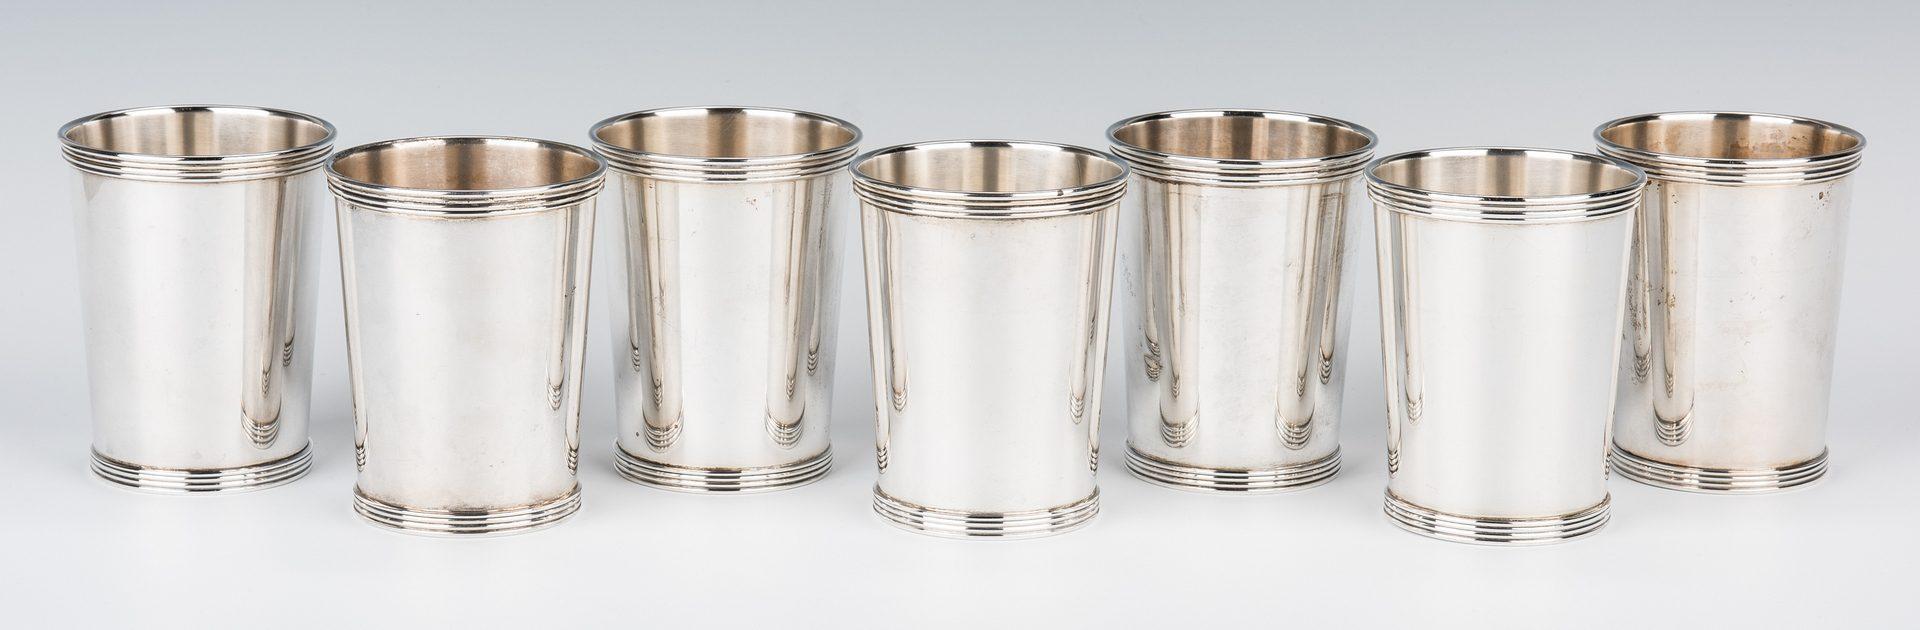 Lot 704: 9 International Sterling Mint Julep Cups